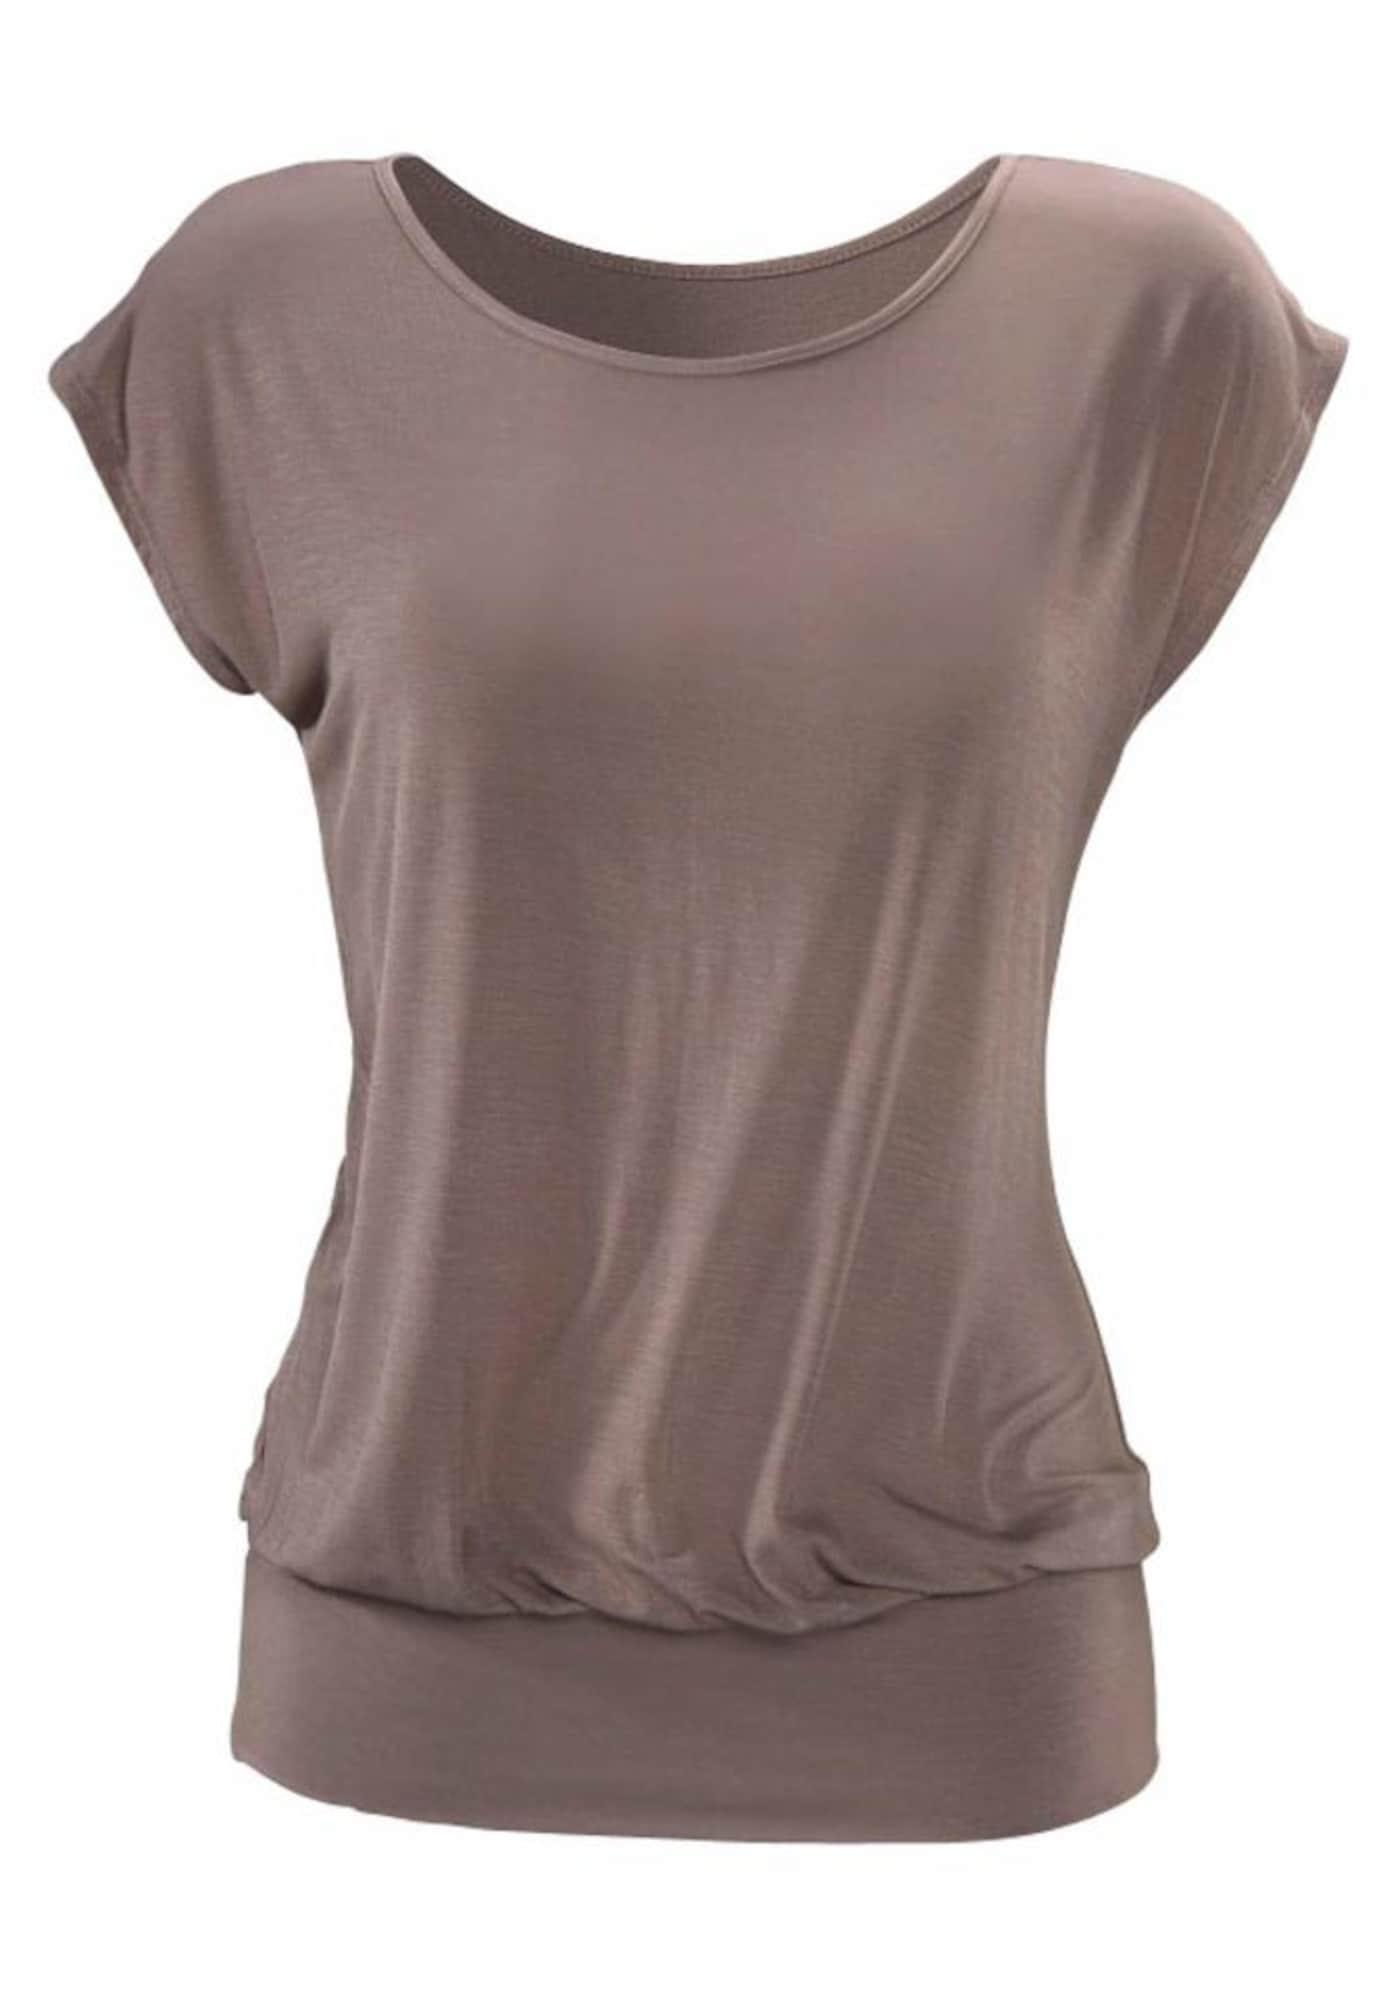 Longshirt | Bekleidung > Shirts > Longshirts | Lascana